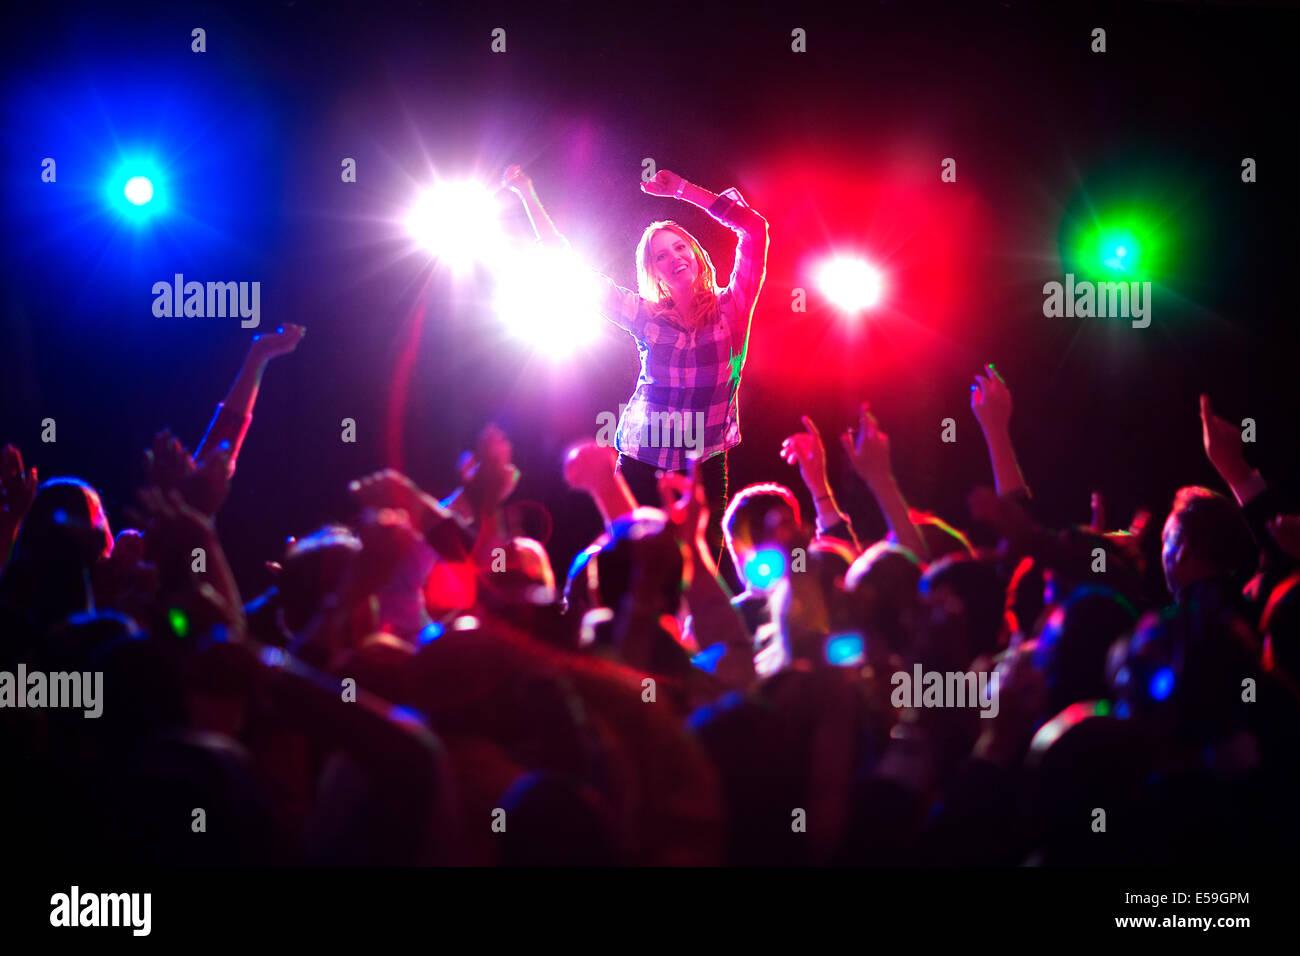 Frau tanzt im Konzert Stockbild